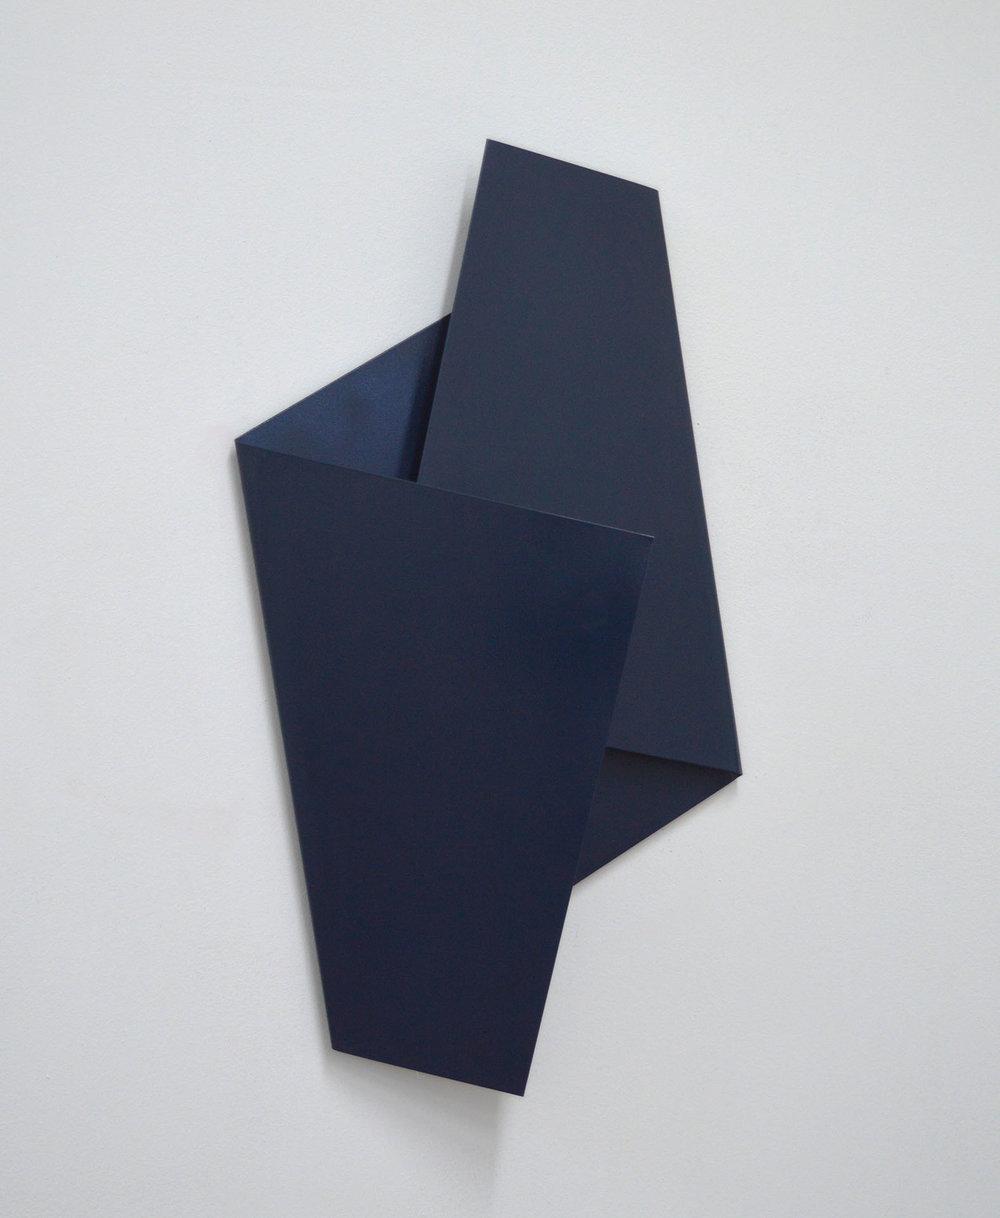 Untitled (840)